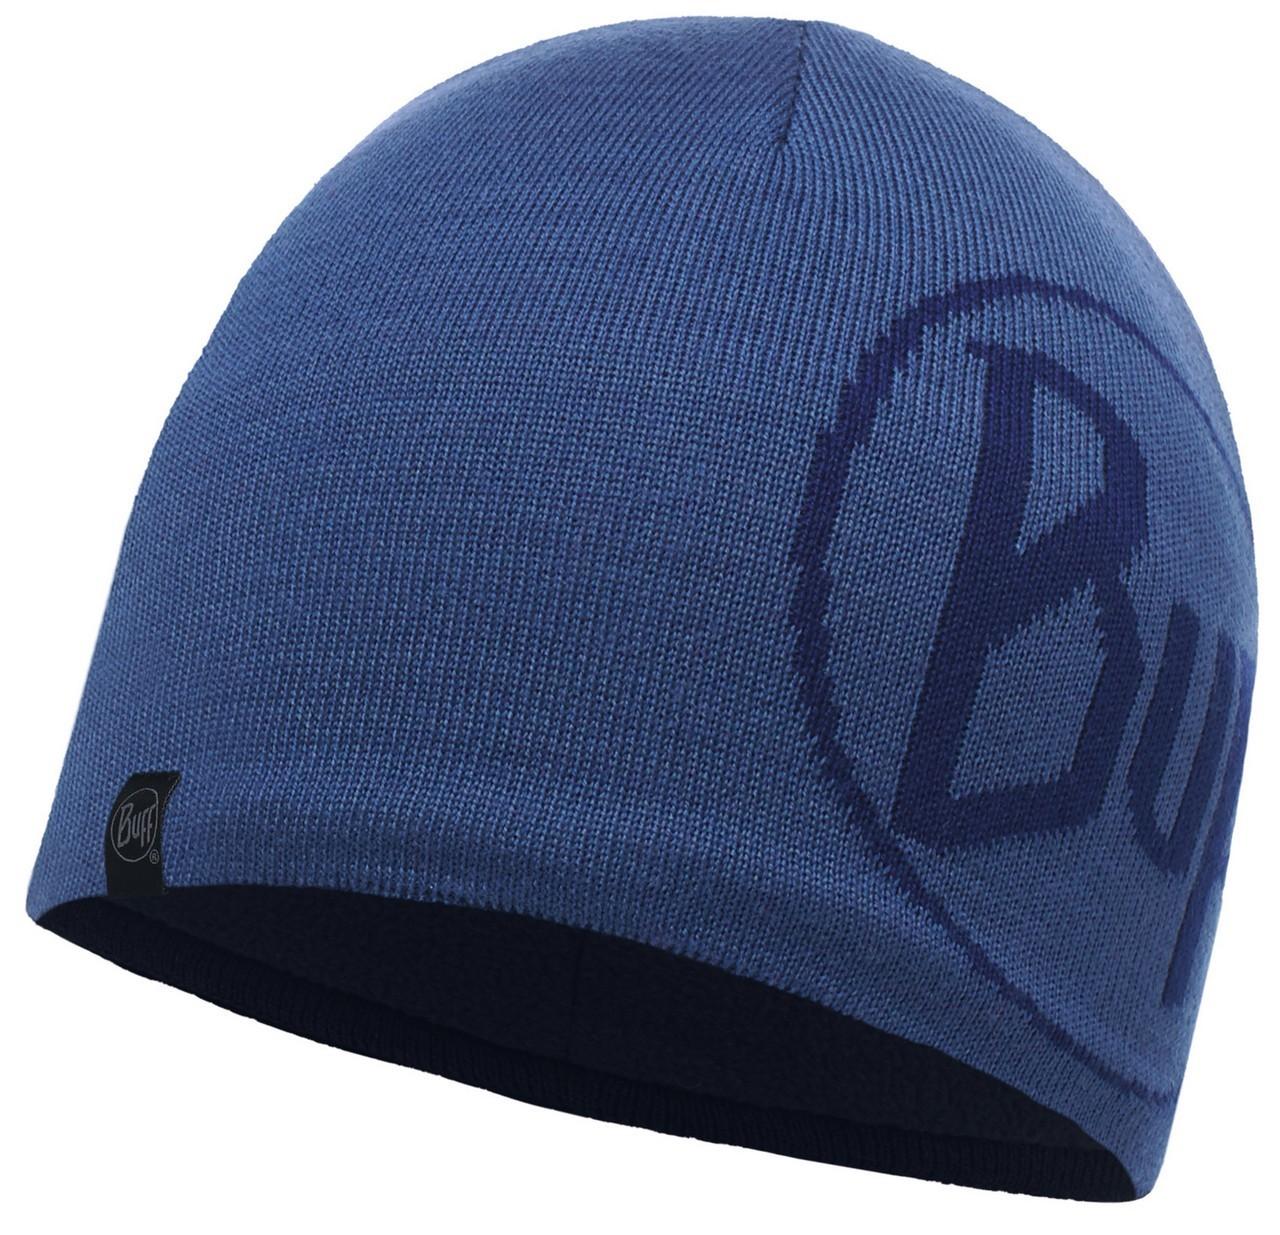 Шапки средней вязки Вязаная шапка с флисовой подкладкой Buff Lech Dusty Blue 113344.742.10.00.jpg